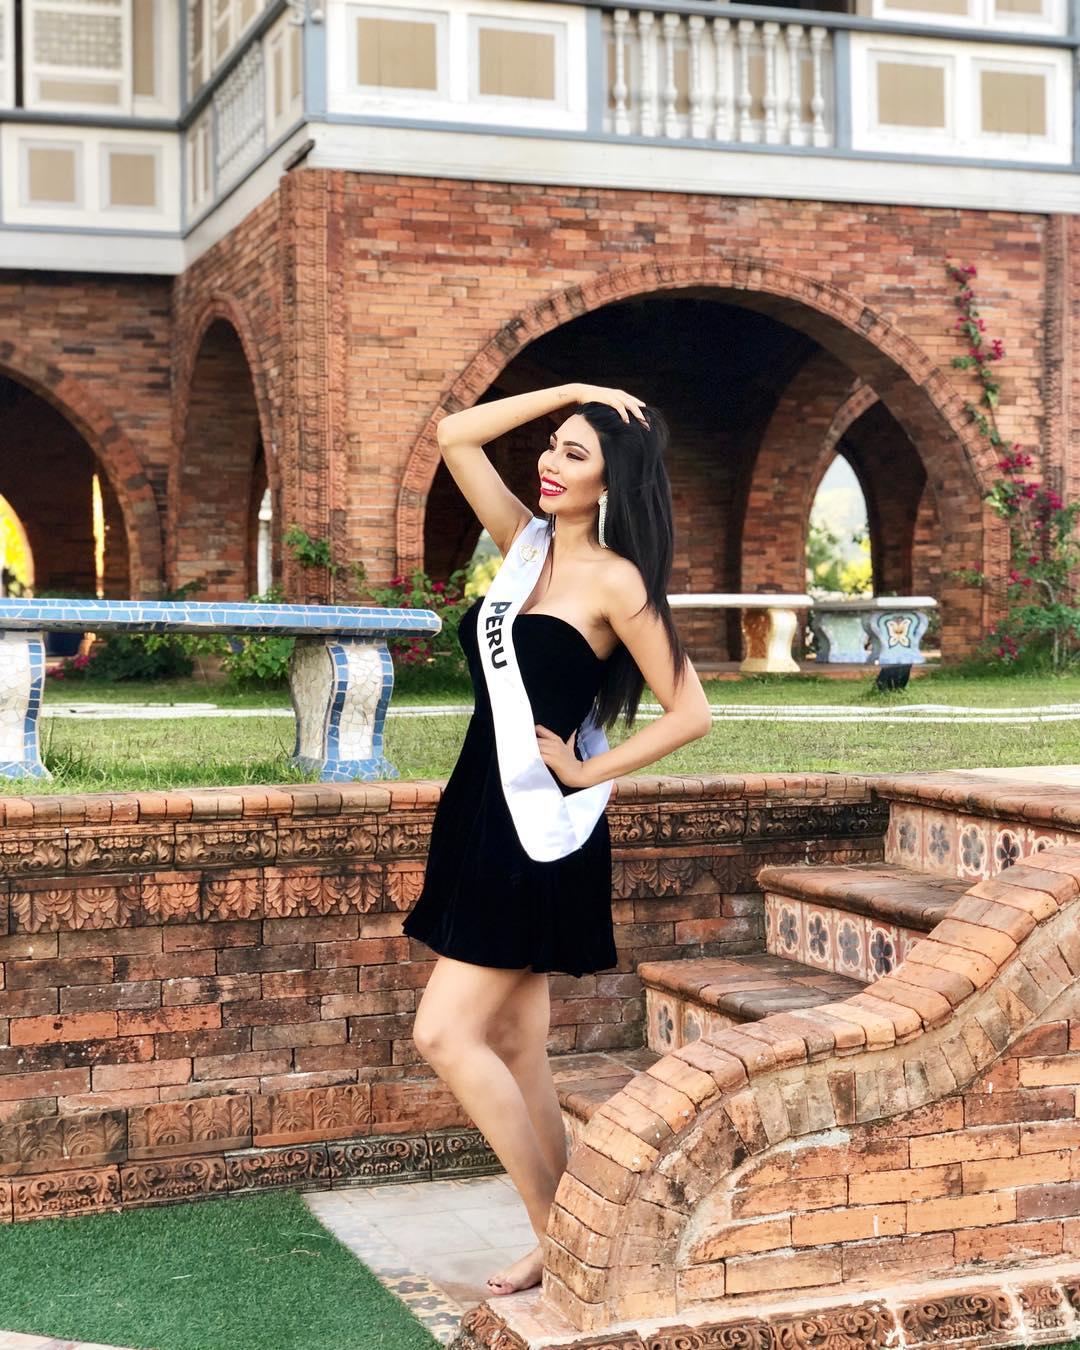 giuliana valenzuela, miss intercontinental peru 2018-2019. - Página 3 47693610